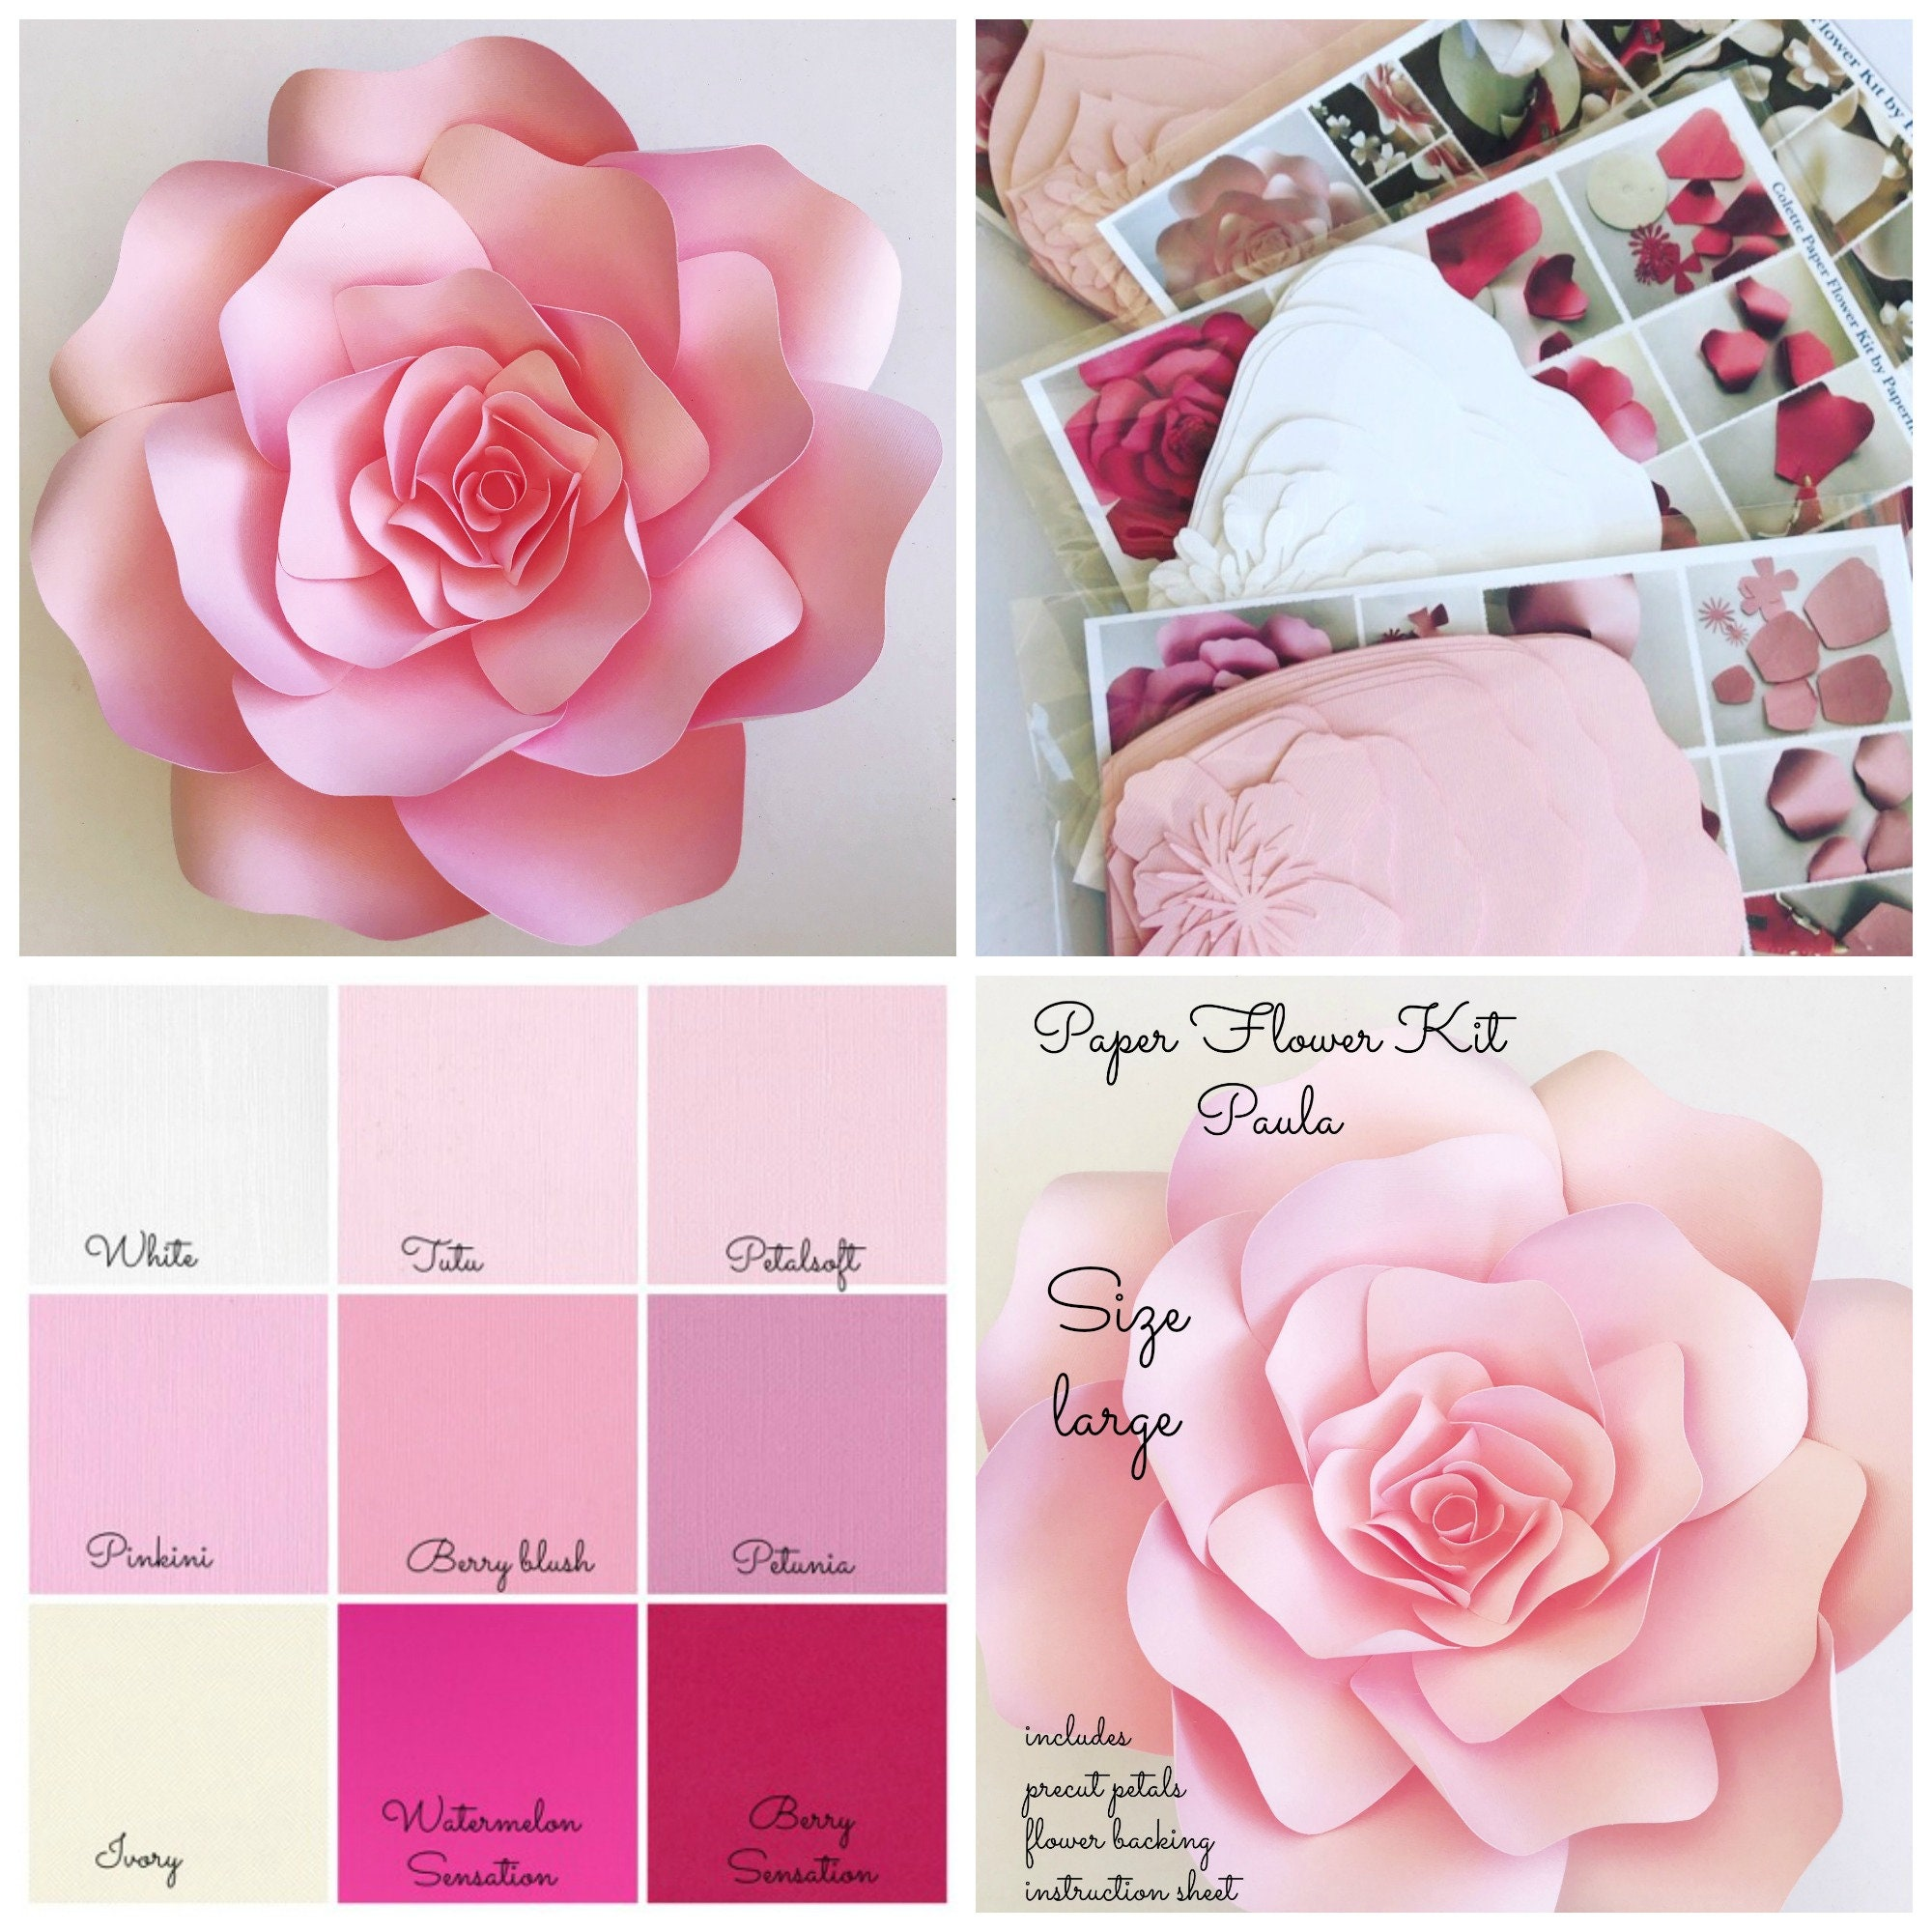 Paper Flower Kit Do It Yourself paper flower kits paper | Etsy